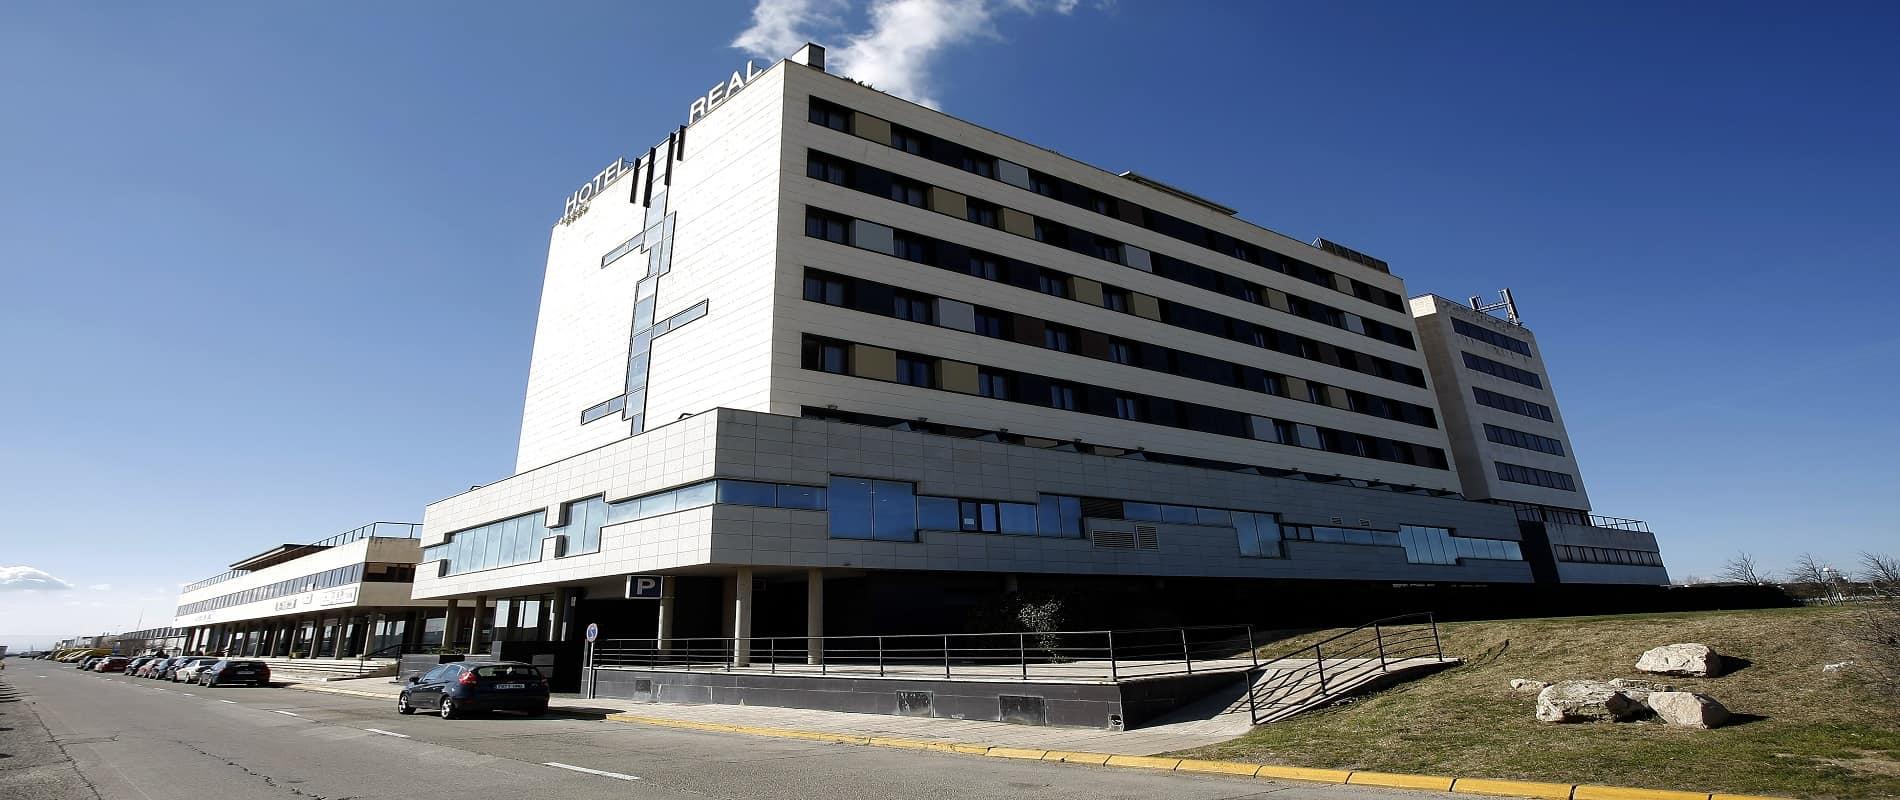 Hotel rcz es alojamiento seguro